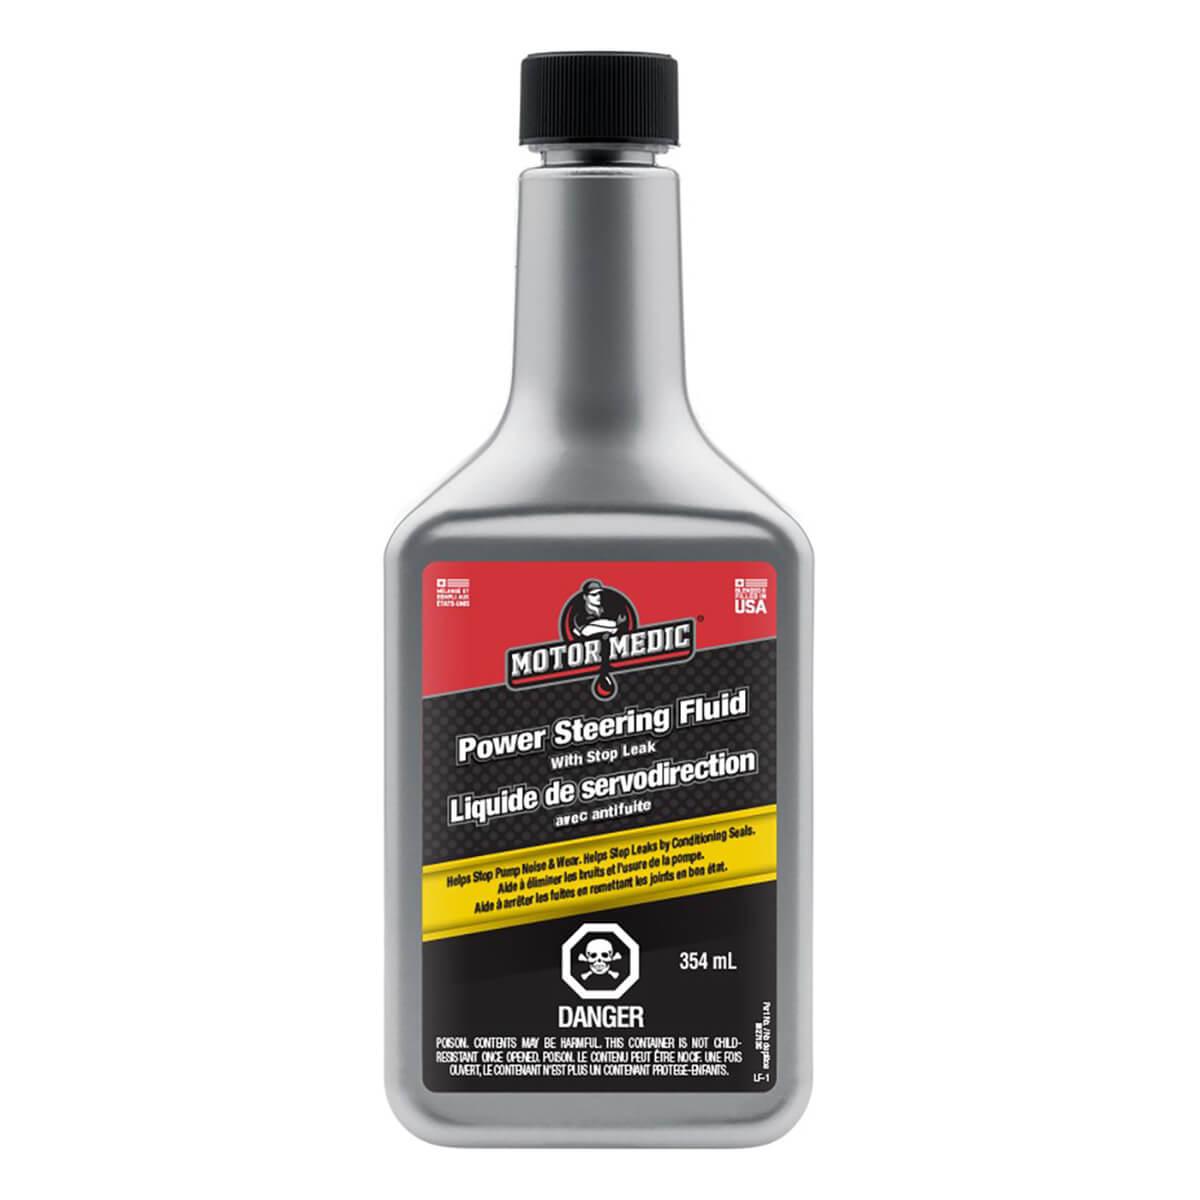 Motor Medic Power Steering Fluid w/Stop Leak - 354ml